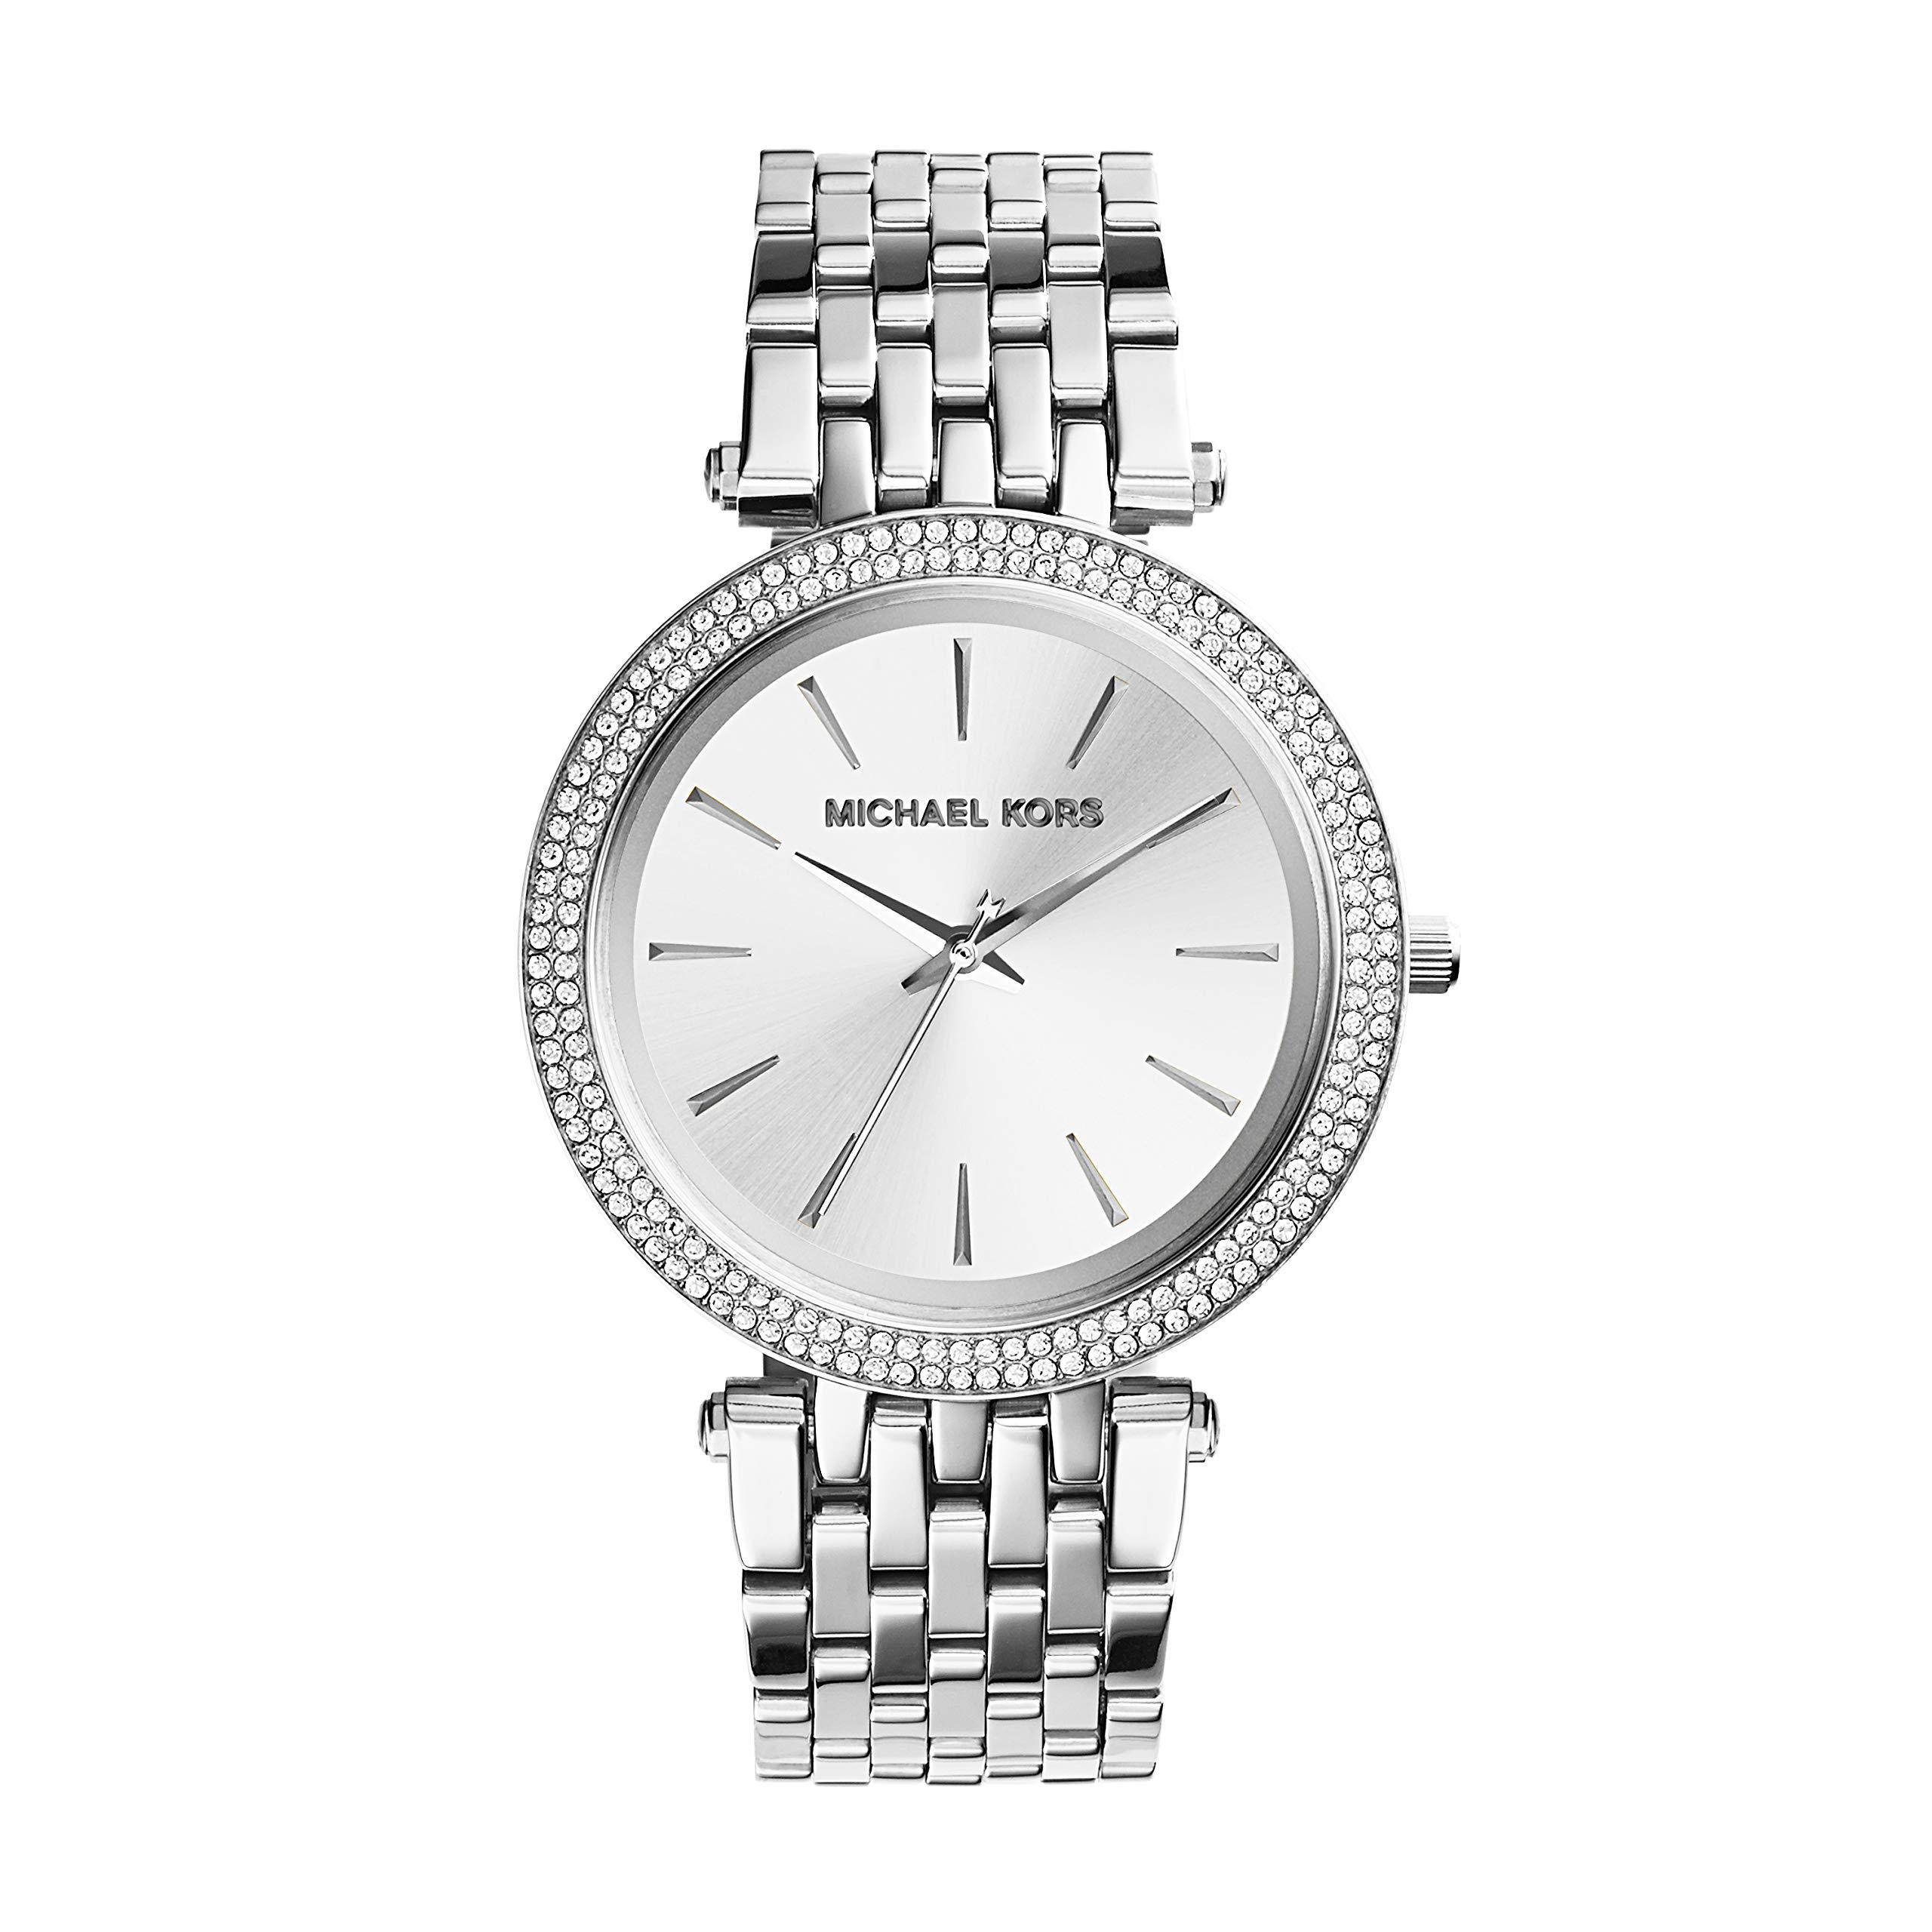 Michael Kors Women's Darci Silver-Tone Watch MK3190 by Michael Kors